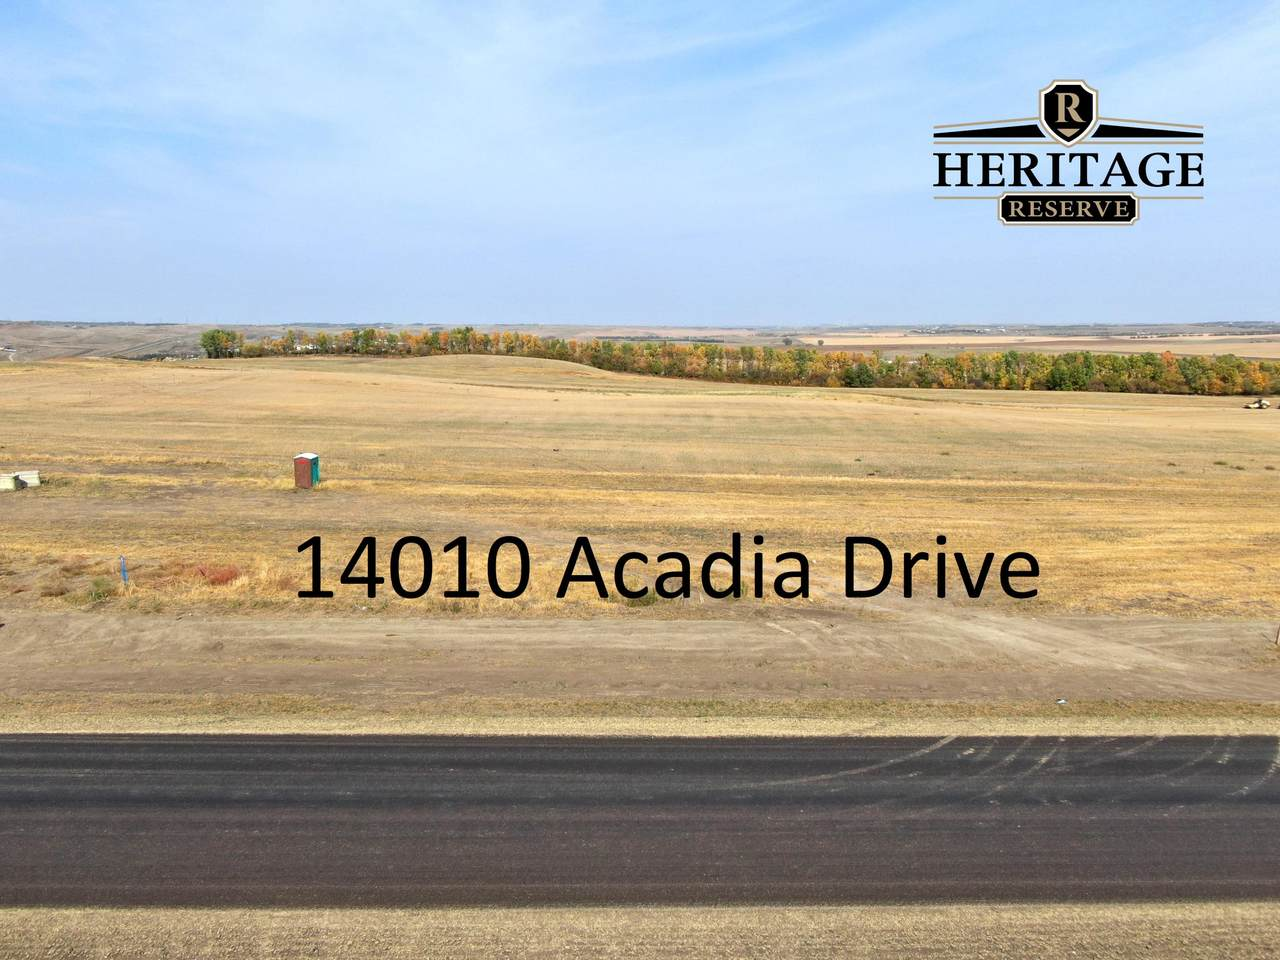 14010 Acadia Drive - Photo 1